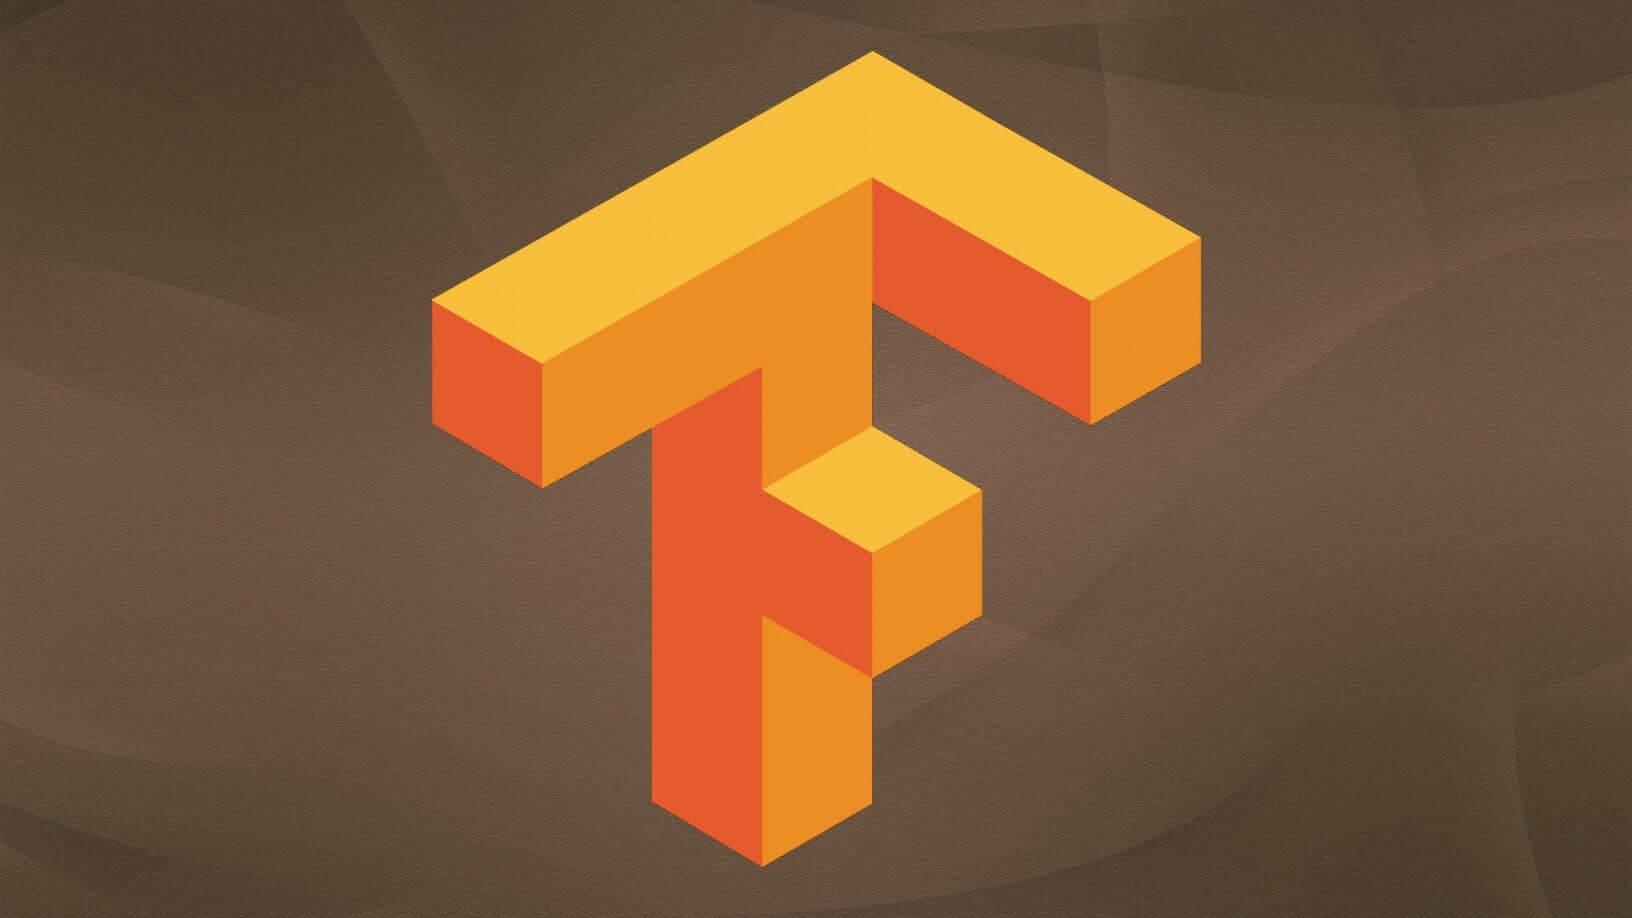 【TensorFlow】TensorFlow – Object Detection